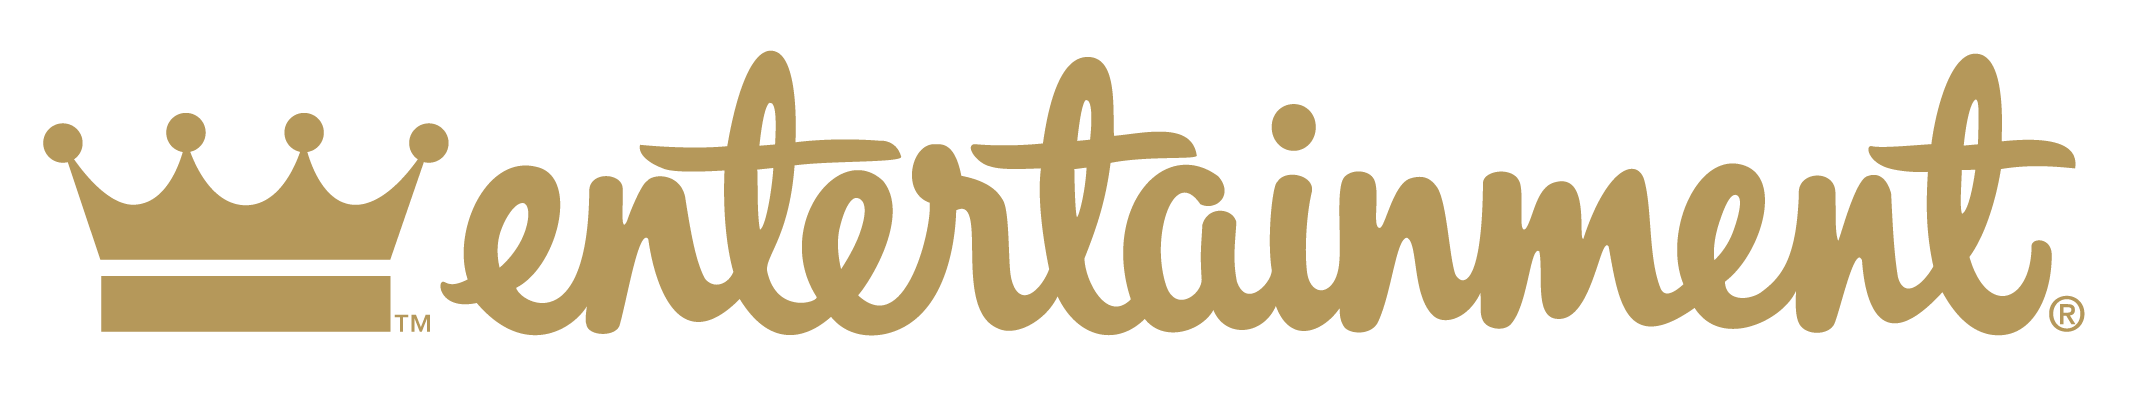 Entertainment-logo-Gold-rgb.png